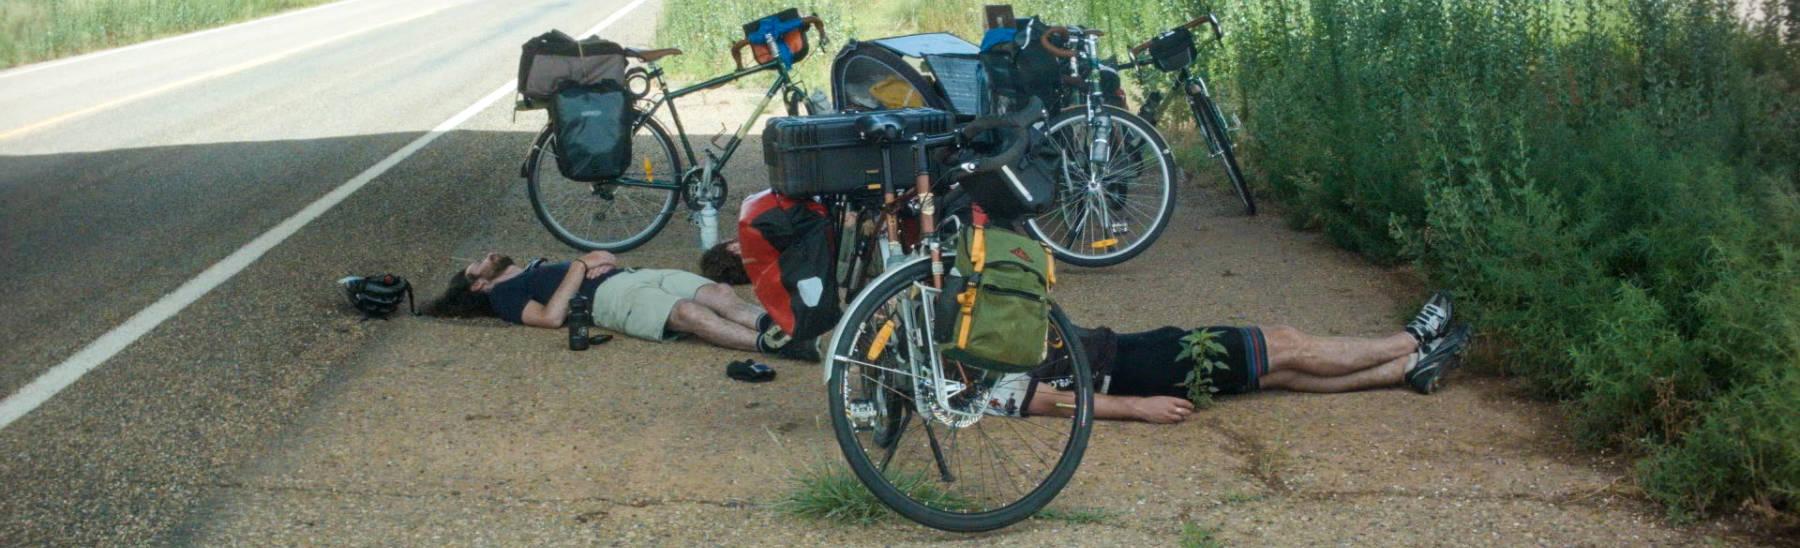 The Bikes of Wrath Riding Across America